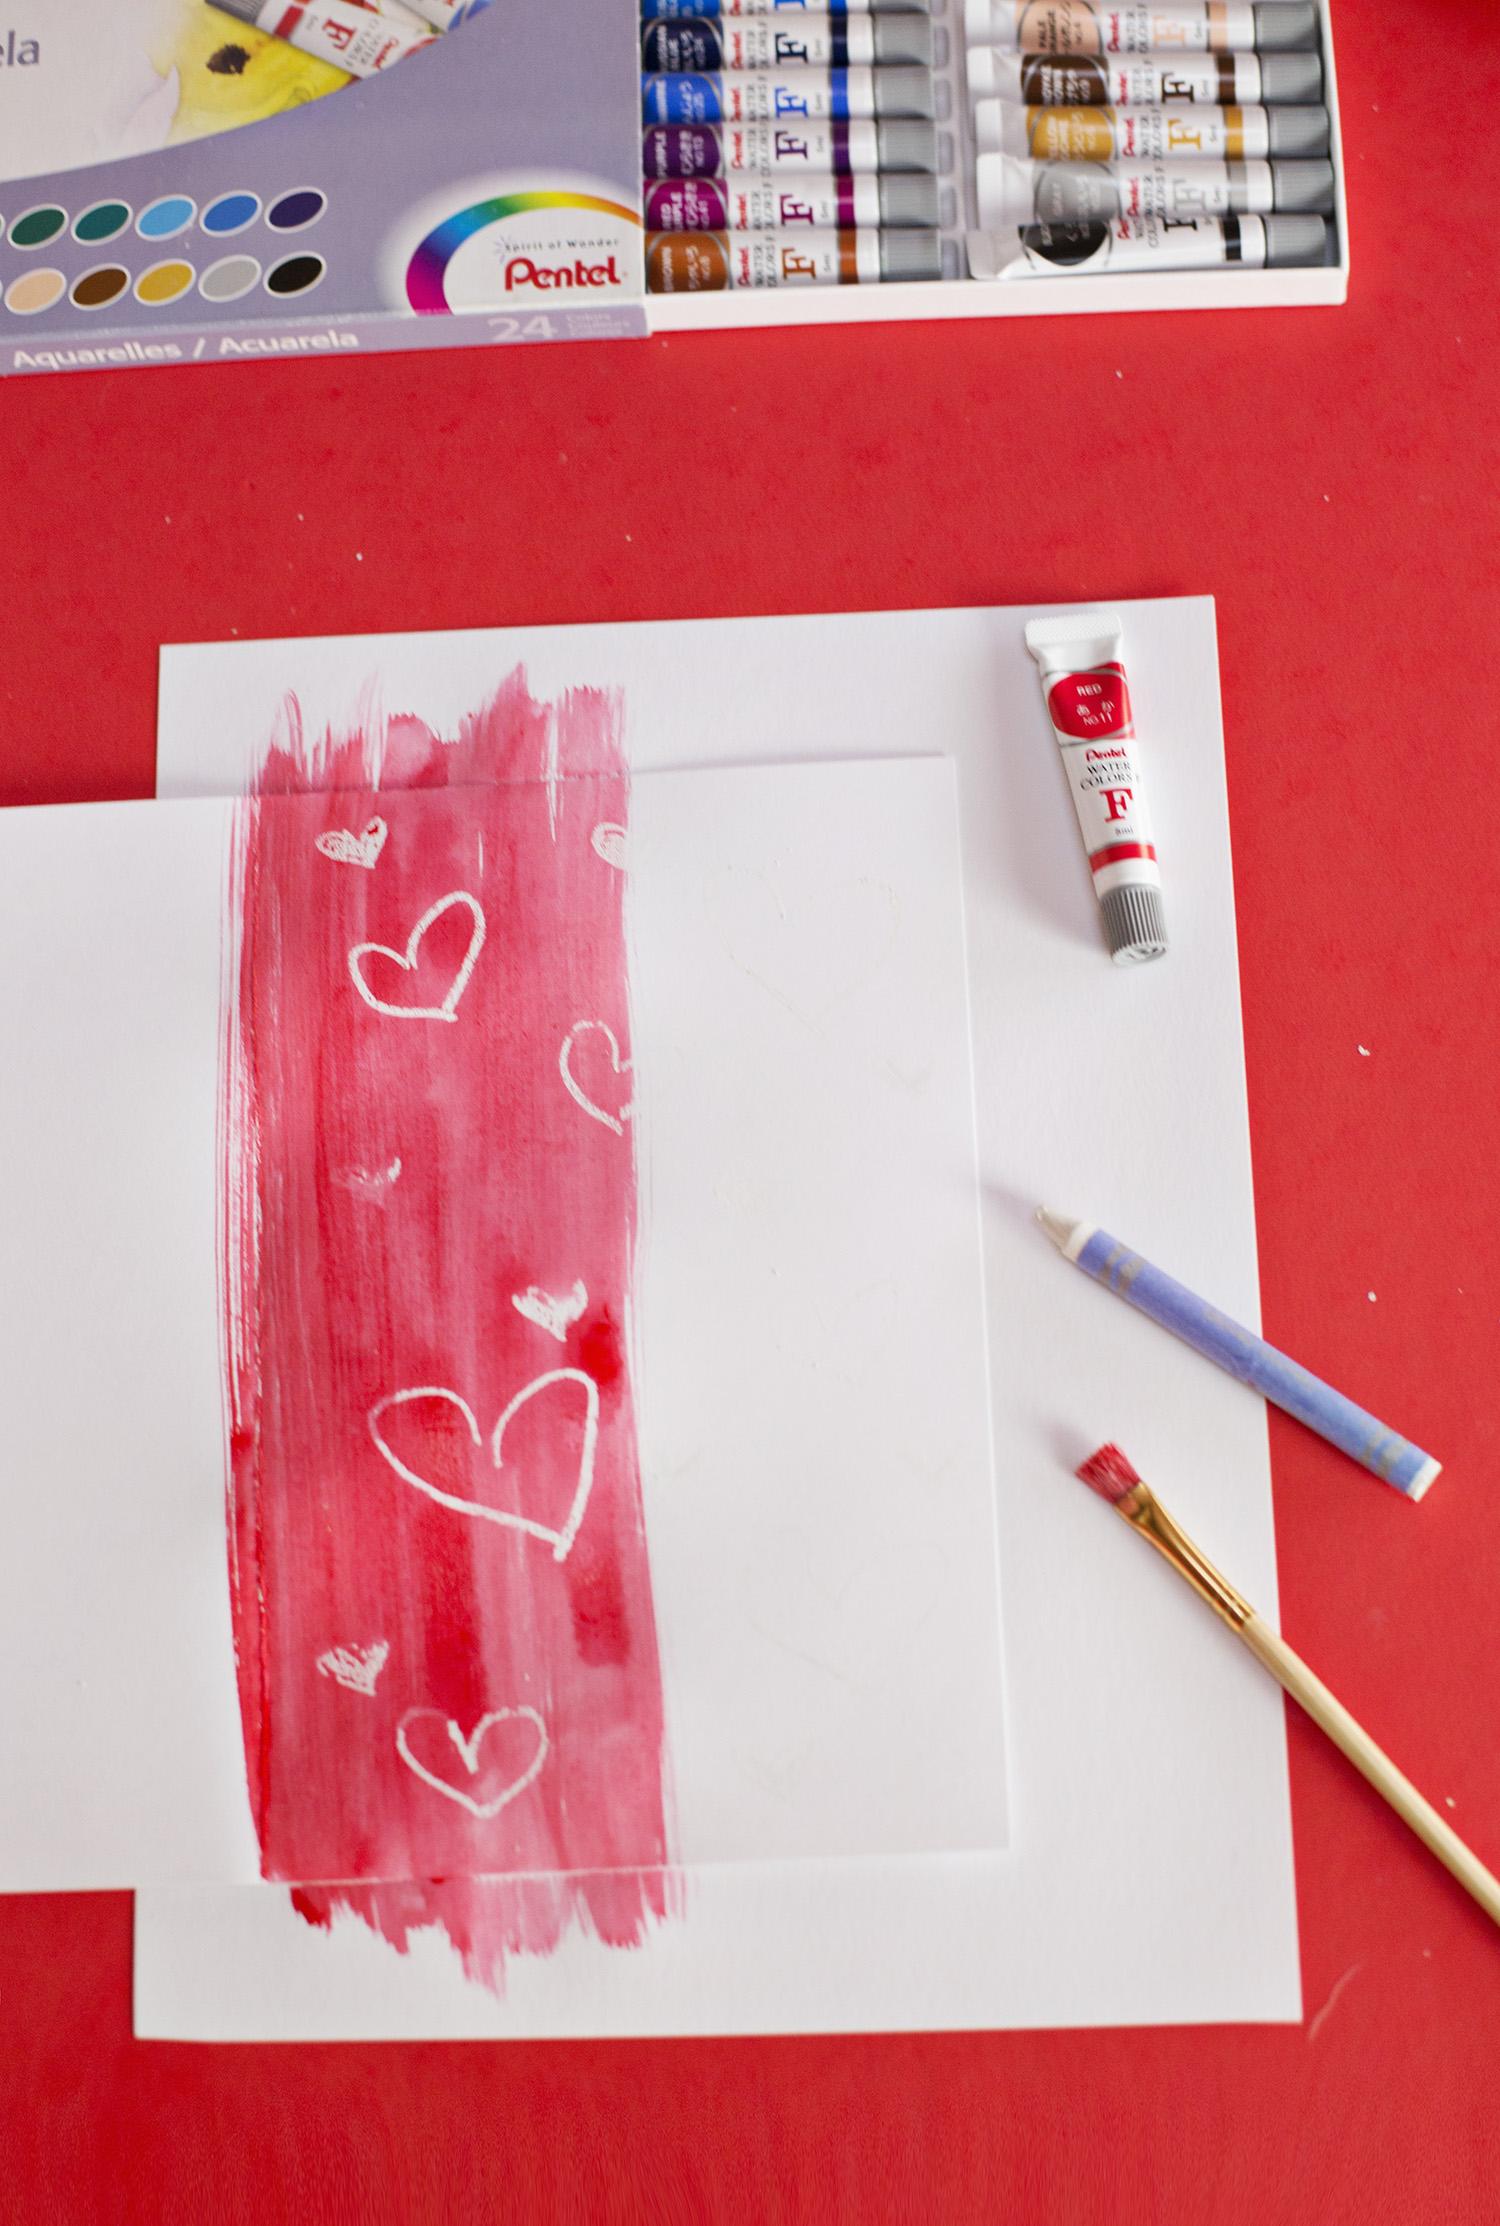 Crayon resist technique